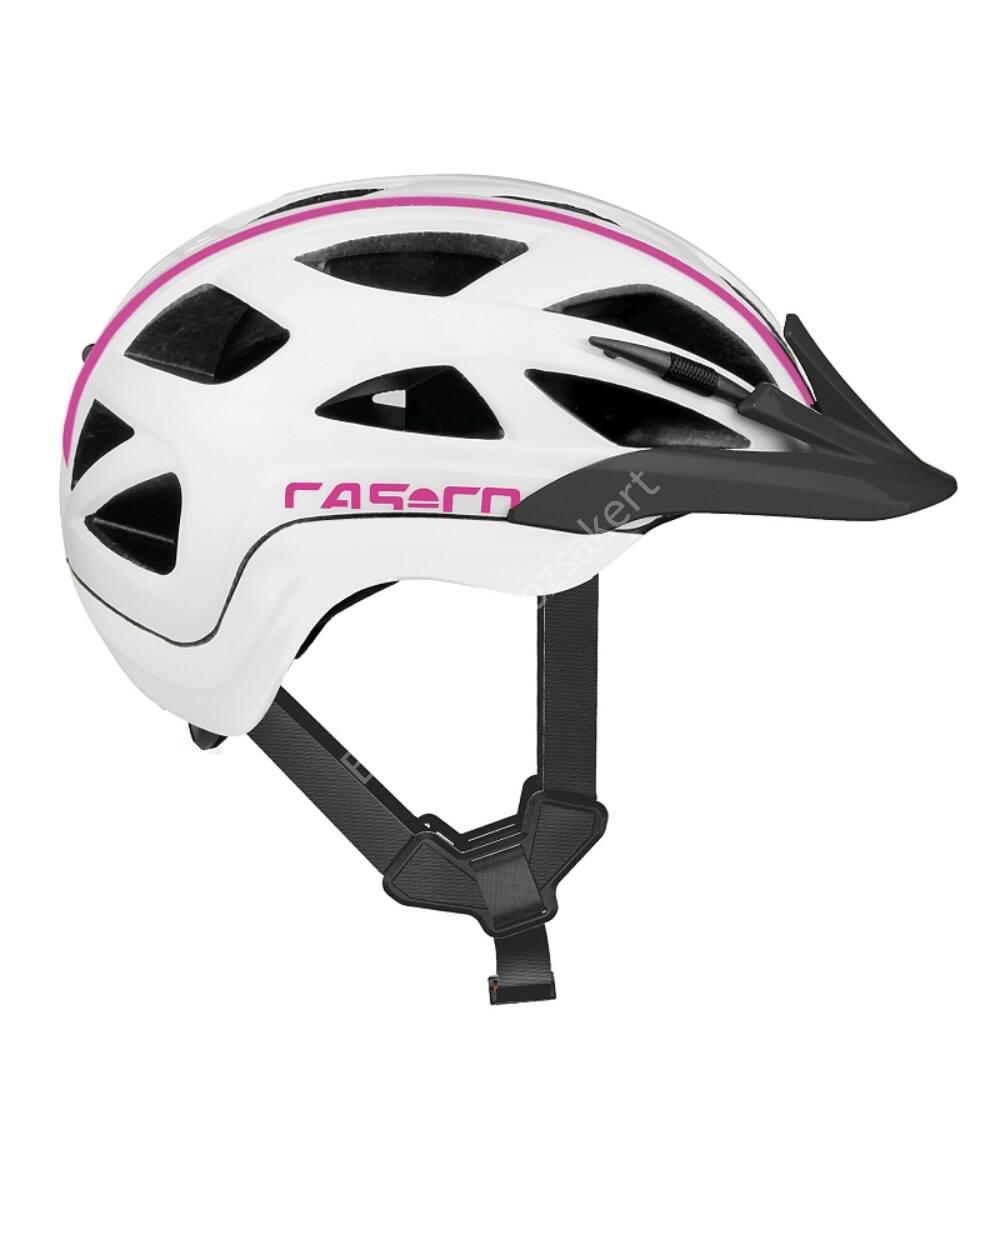 Casco Activ 2 Junior bukósisak, 52-56cm, fehér-pink